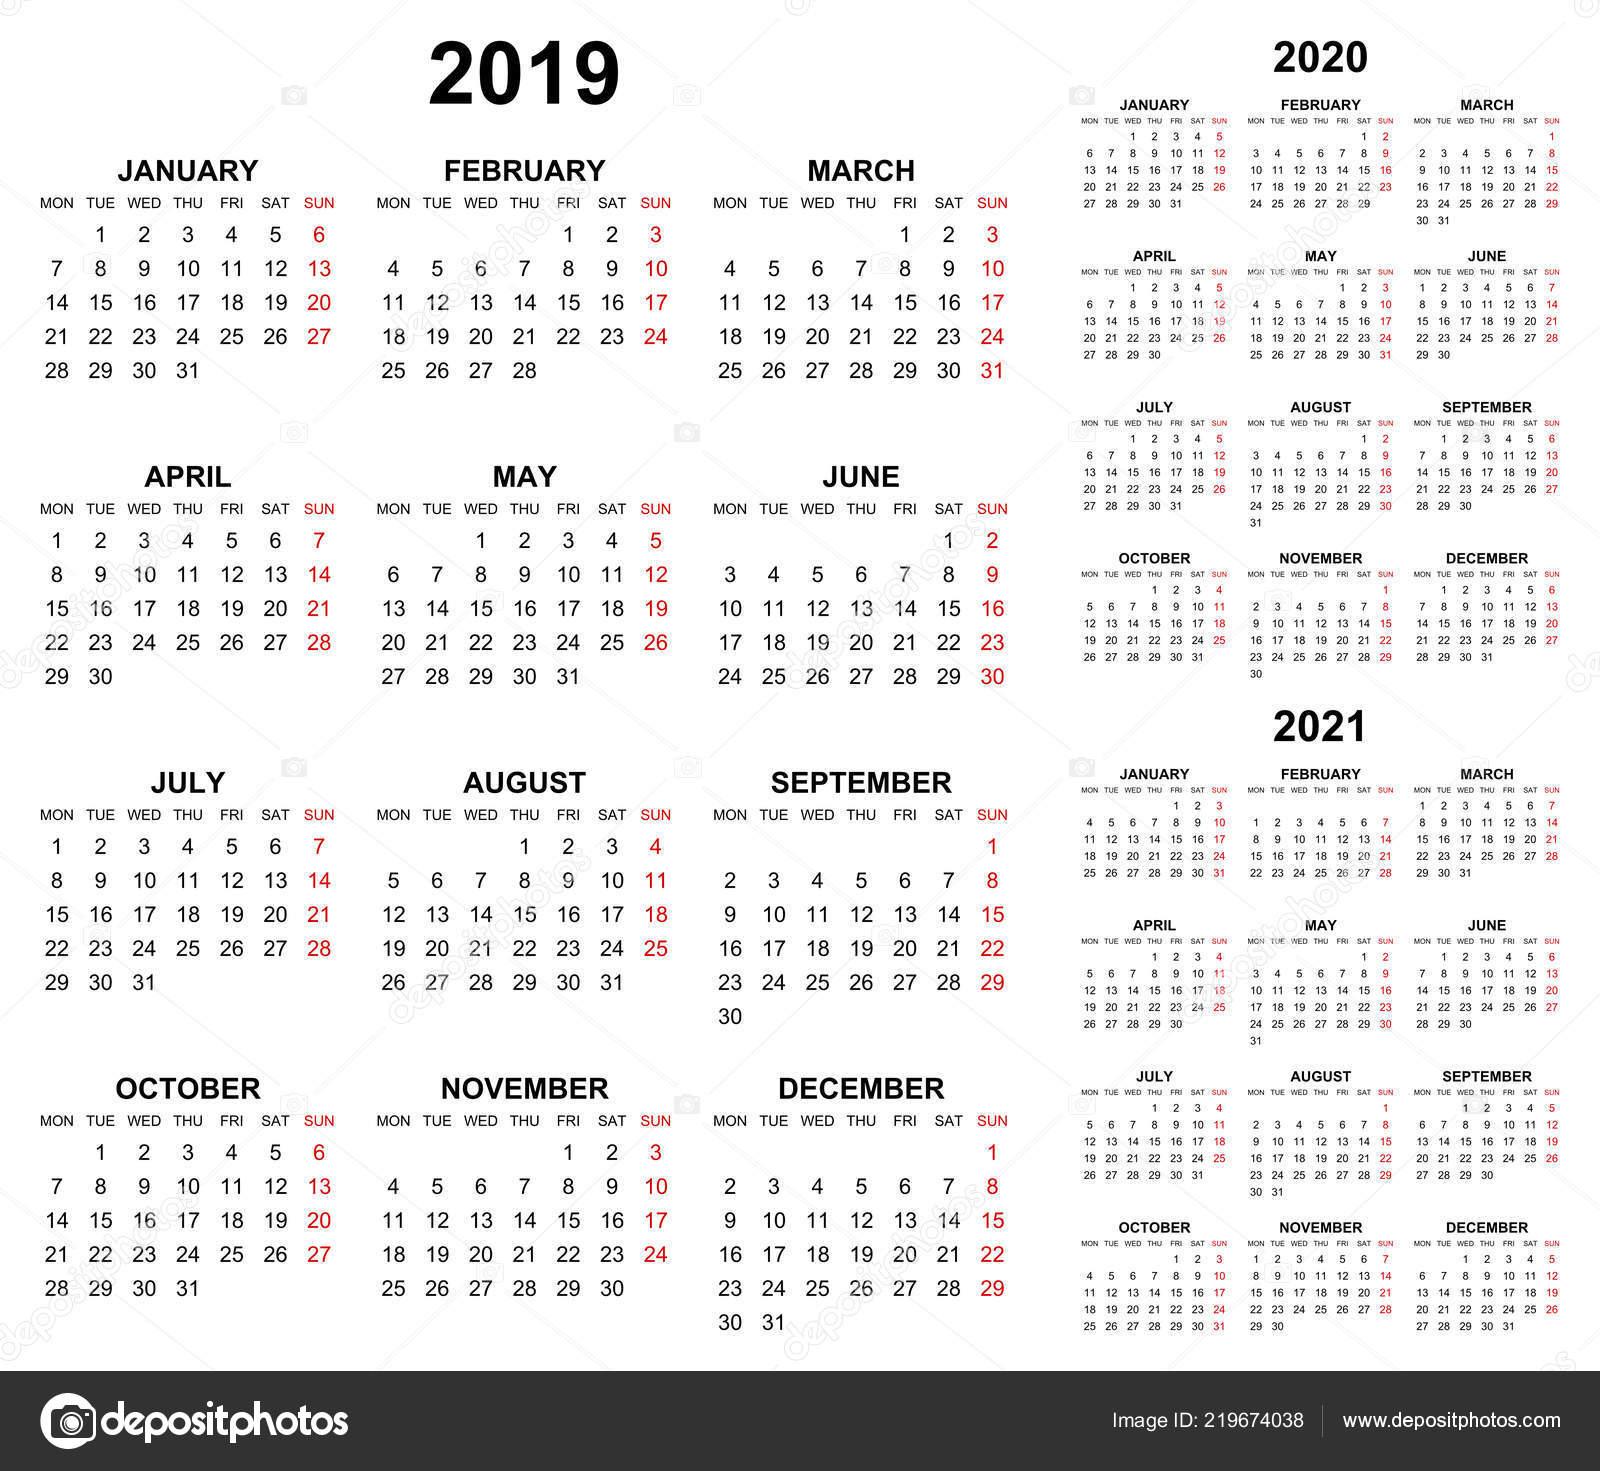 Calendario 2020 Editable Illustrator.Simple Editable Vector Calendars Year 2019 2020 2021 Mondays